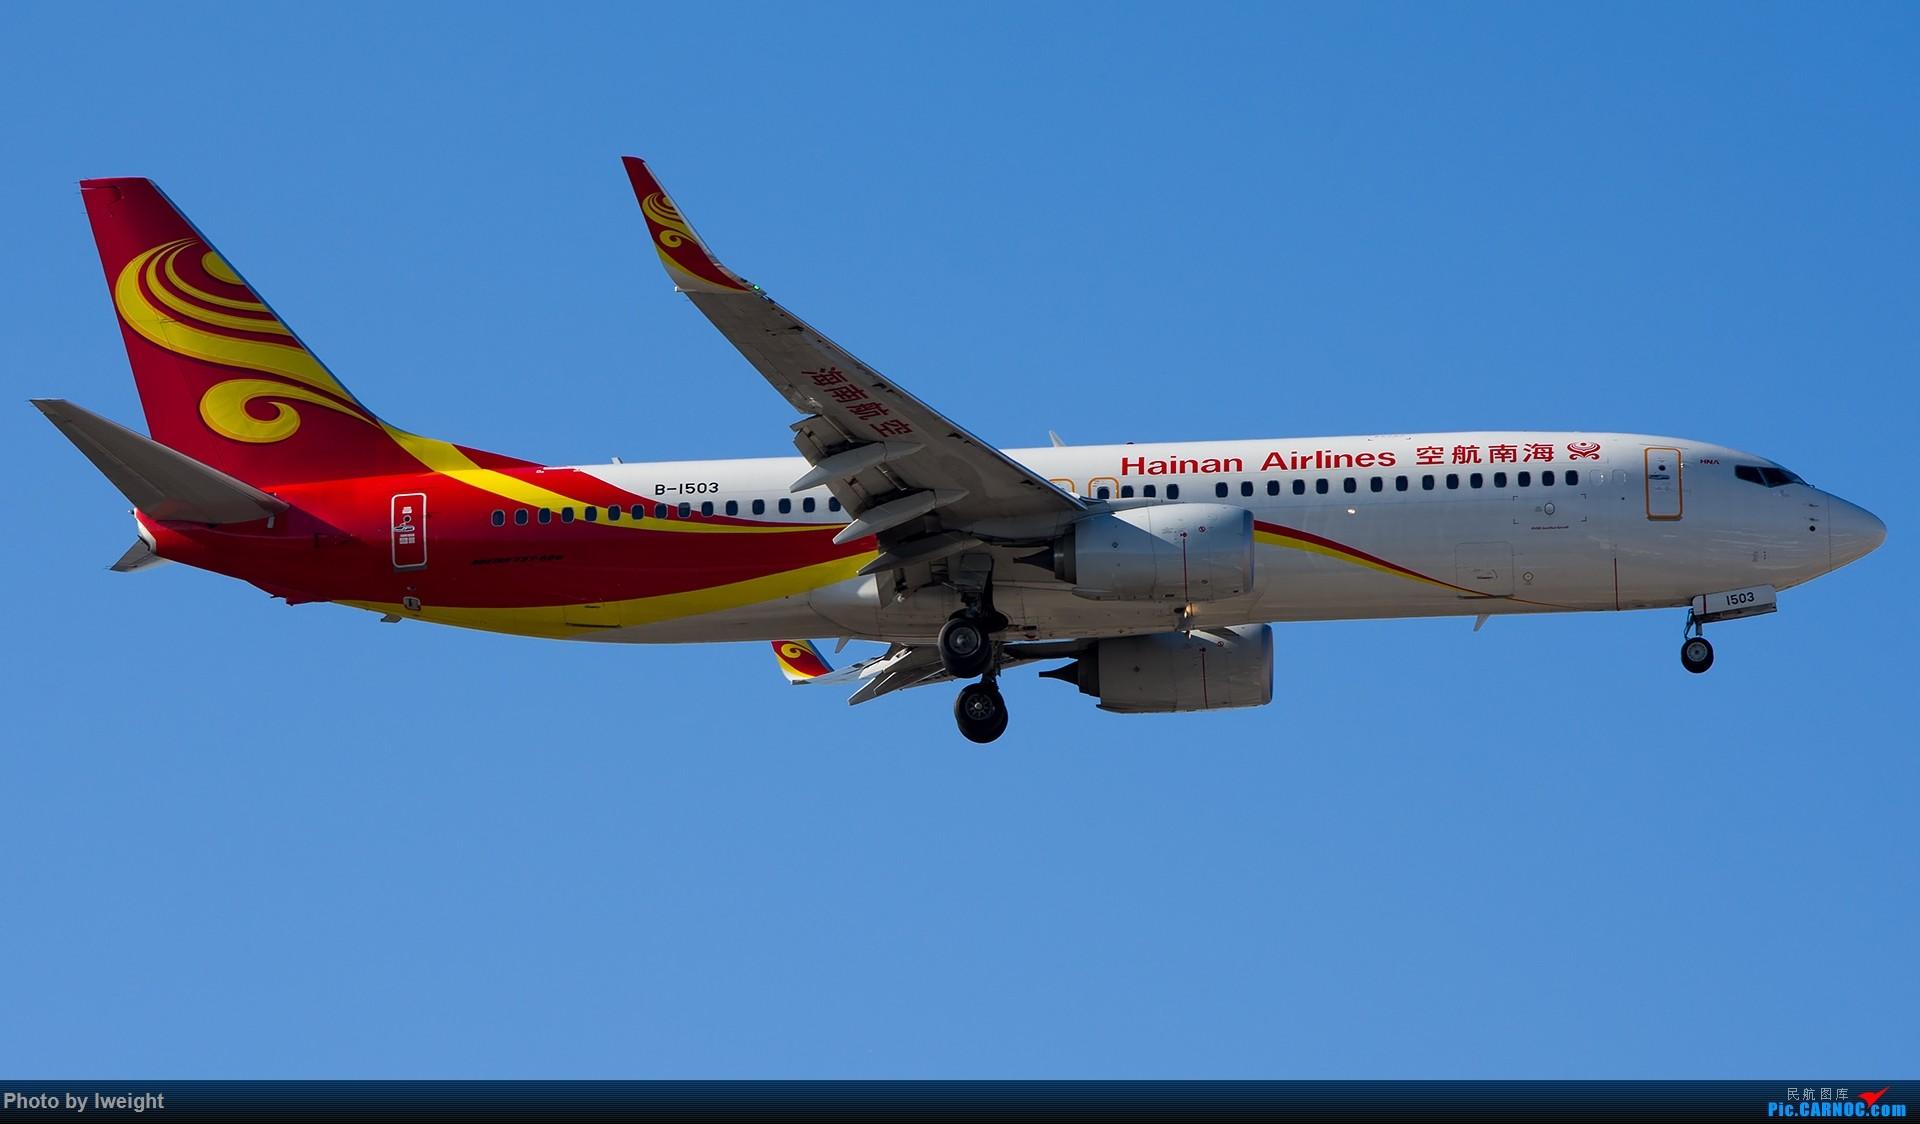 Re:[原创]终于在12月的北京等到了一个晴天的周末,出来拍拍飞机【2015-12-5】 BOEING 737-800 B-1503 中国北京首都国际机场